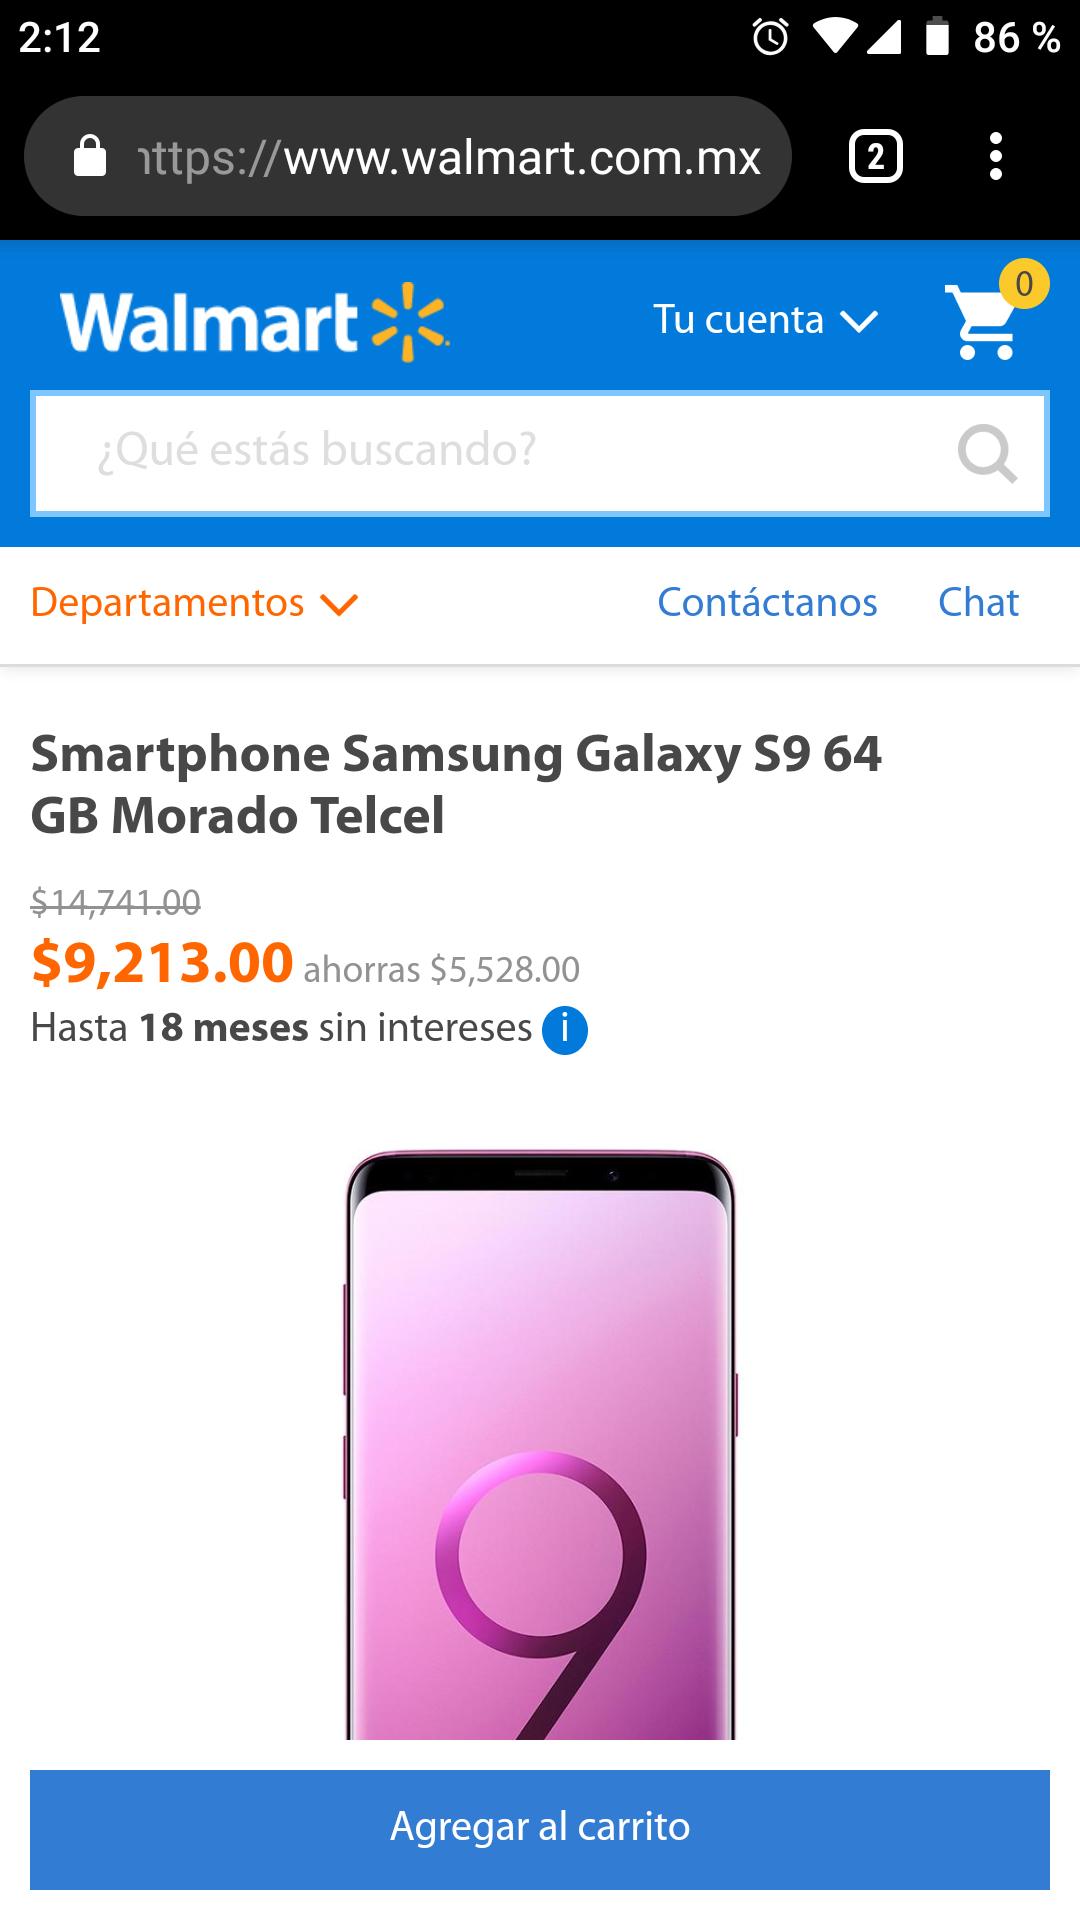 Walmart: Samsung Galaxy s9 64 GB Telcel